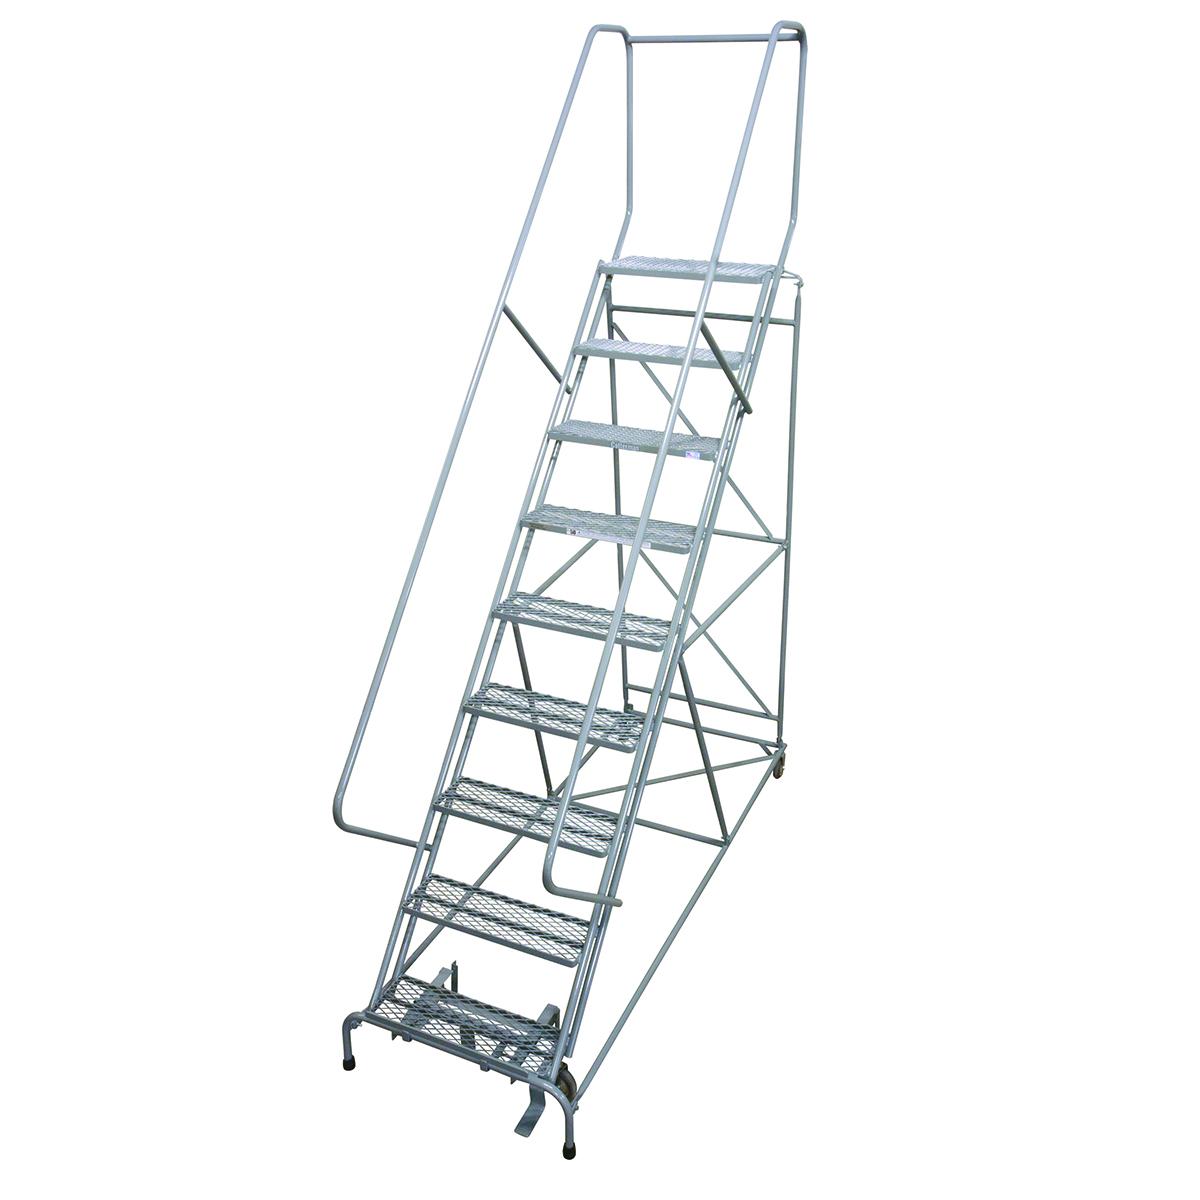 Easy 50 Climbing Angle Ladders